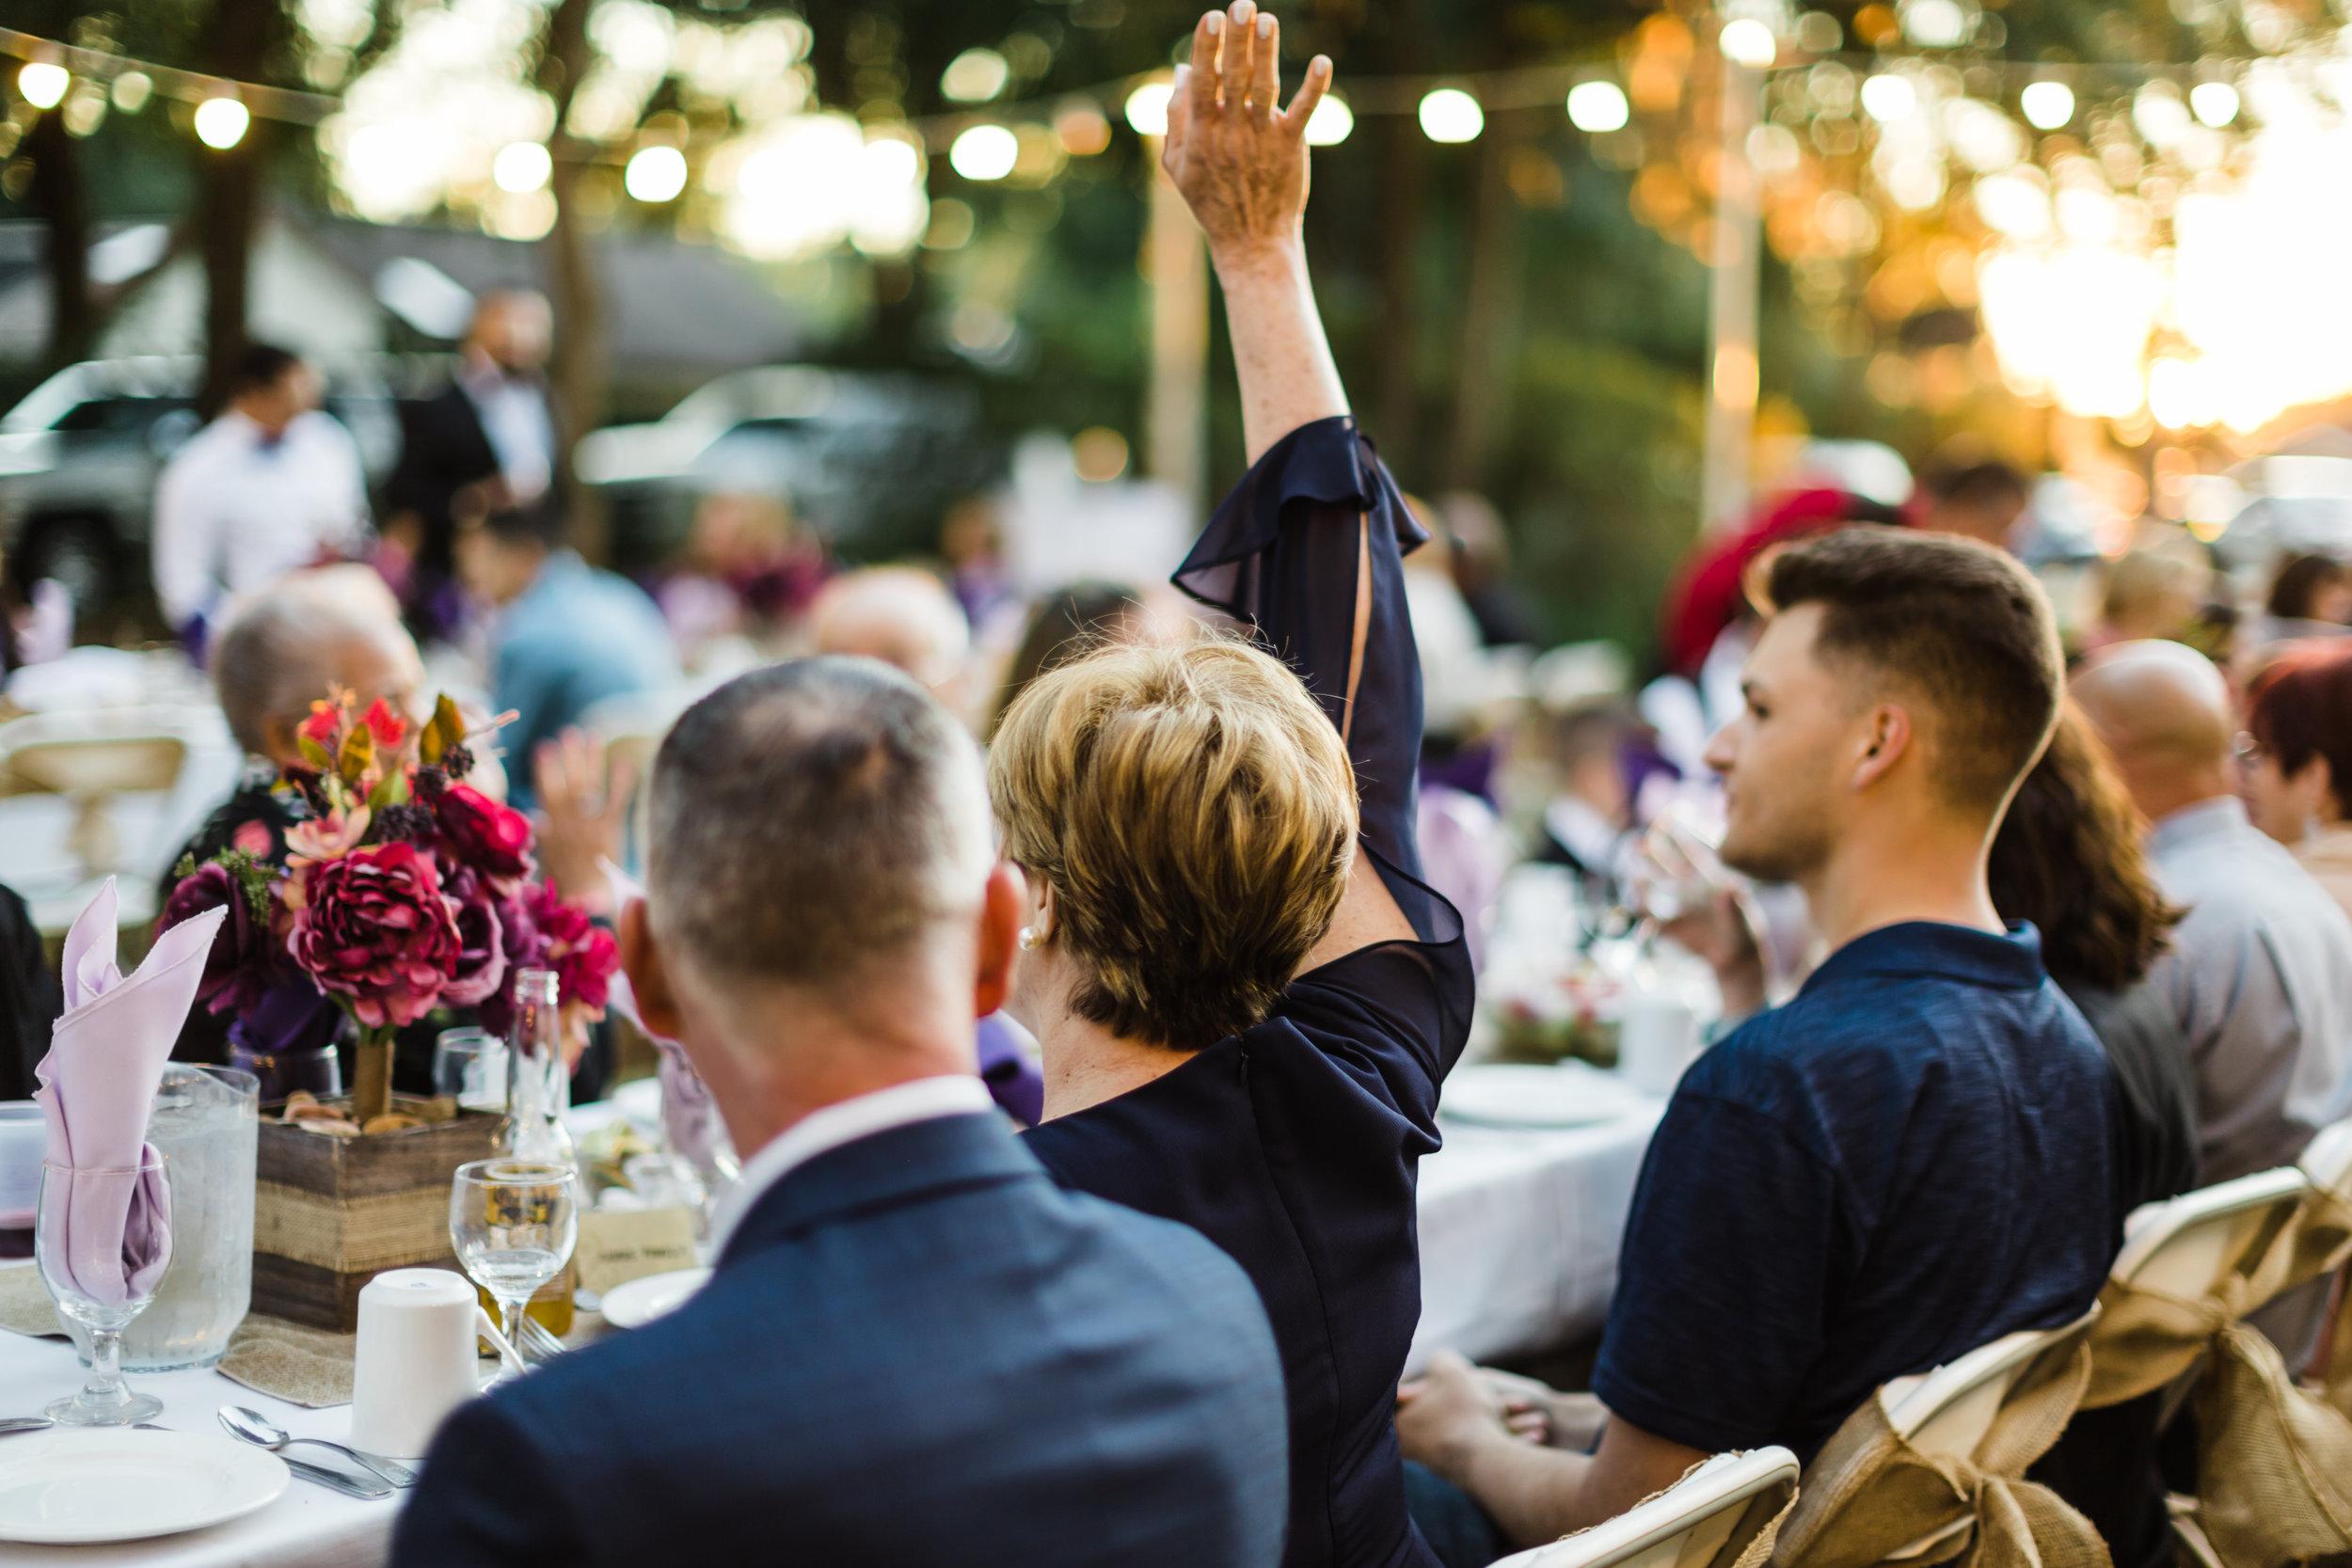 2018.11.03 Jael and Edel Ocala Wedding FINALS (362 of 441).jpg